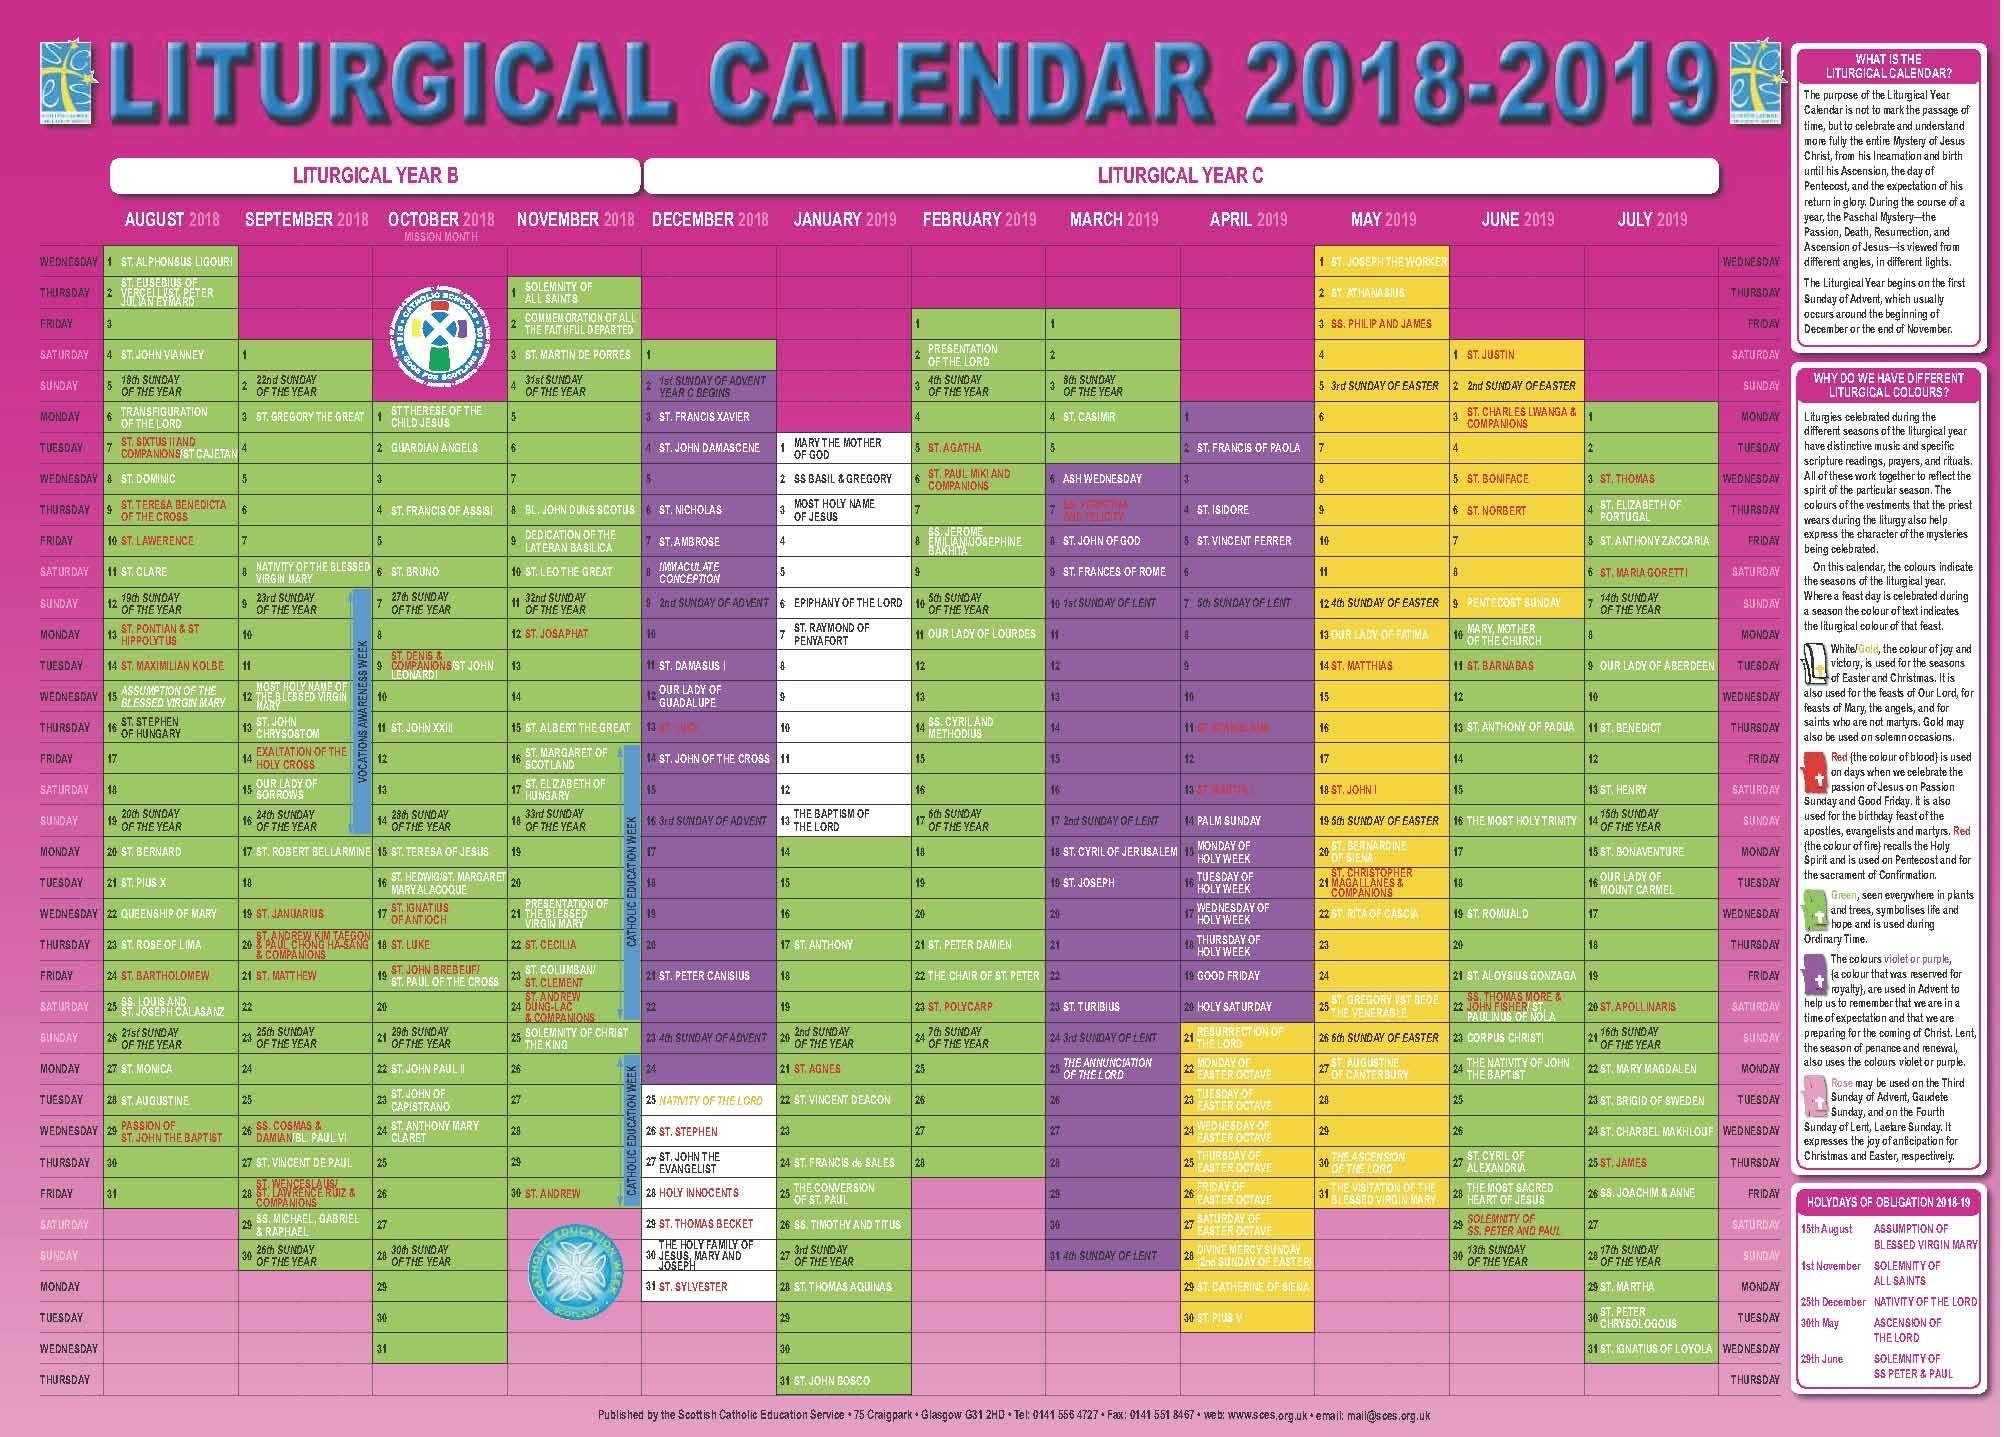 Scottish Catholic Education Service | Sces | Liturgical Calendar intended for Catholic Liturgical Calendar 2020 Pdf